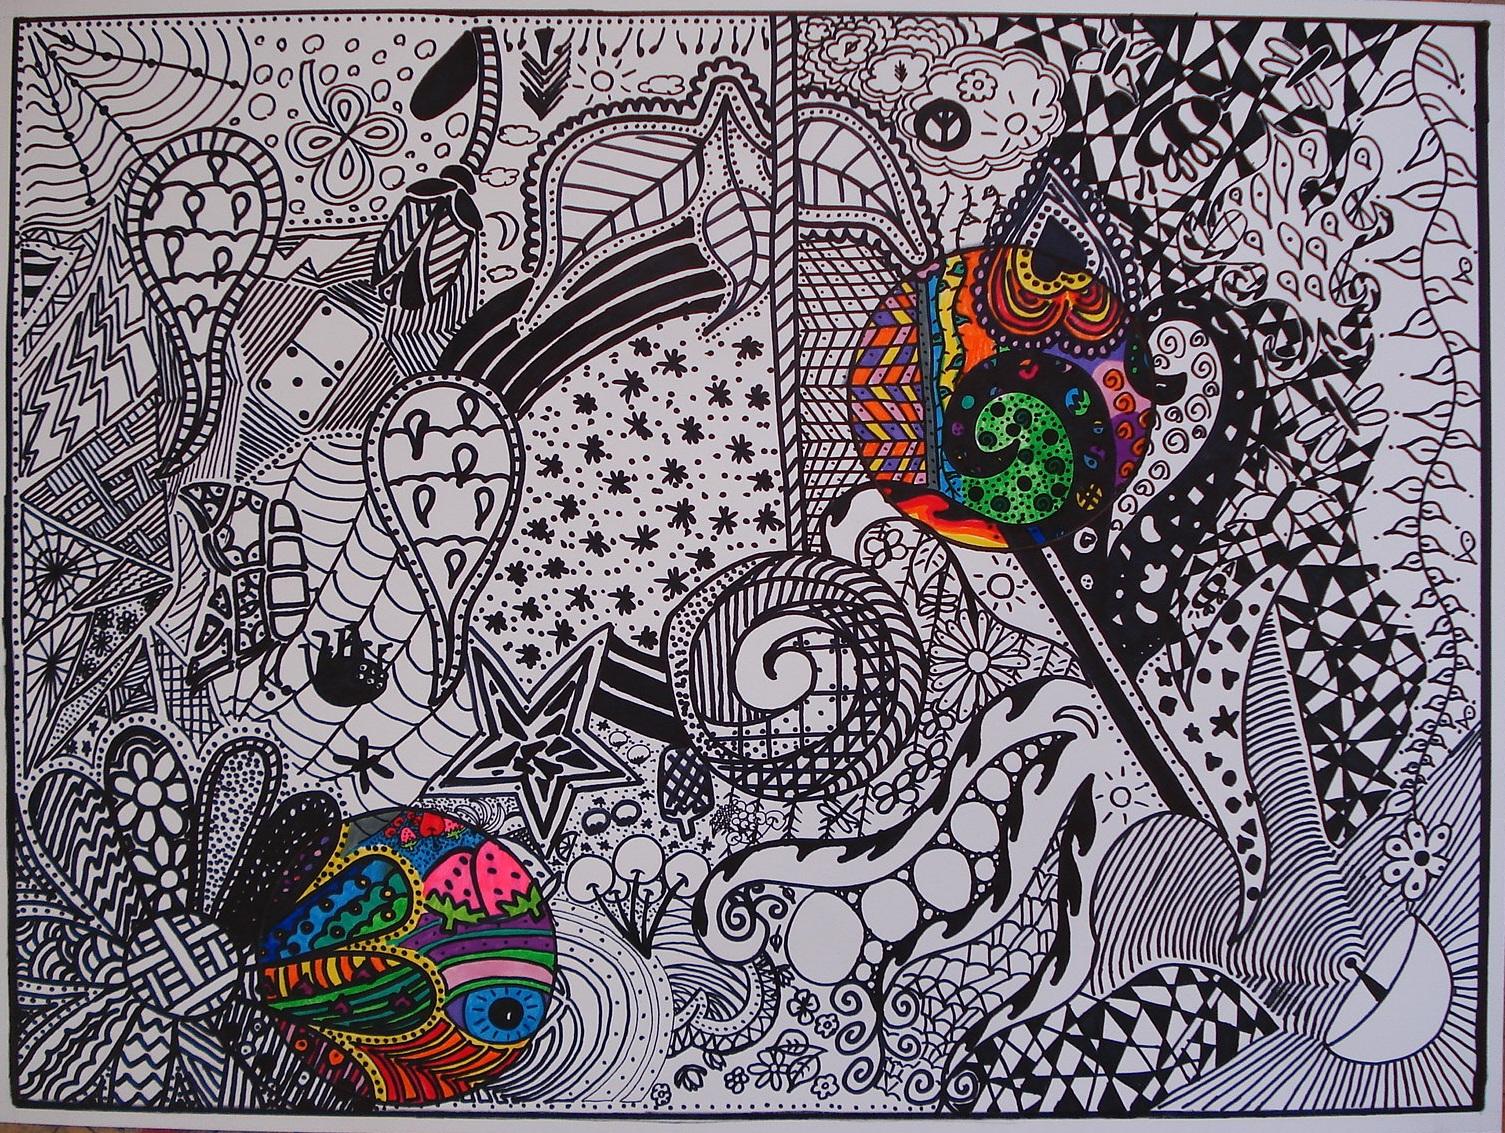 Art Sub Lessons Black And White Doodle Design